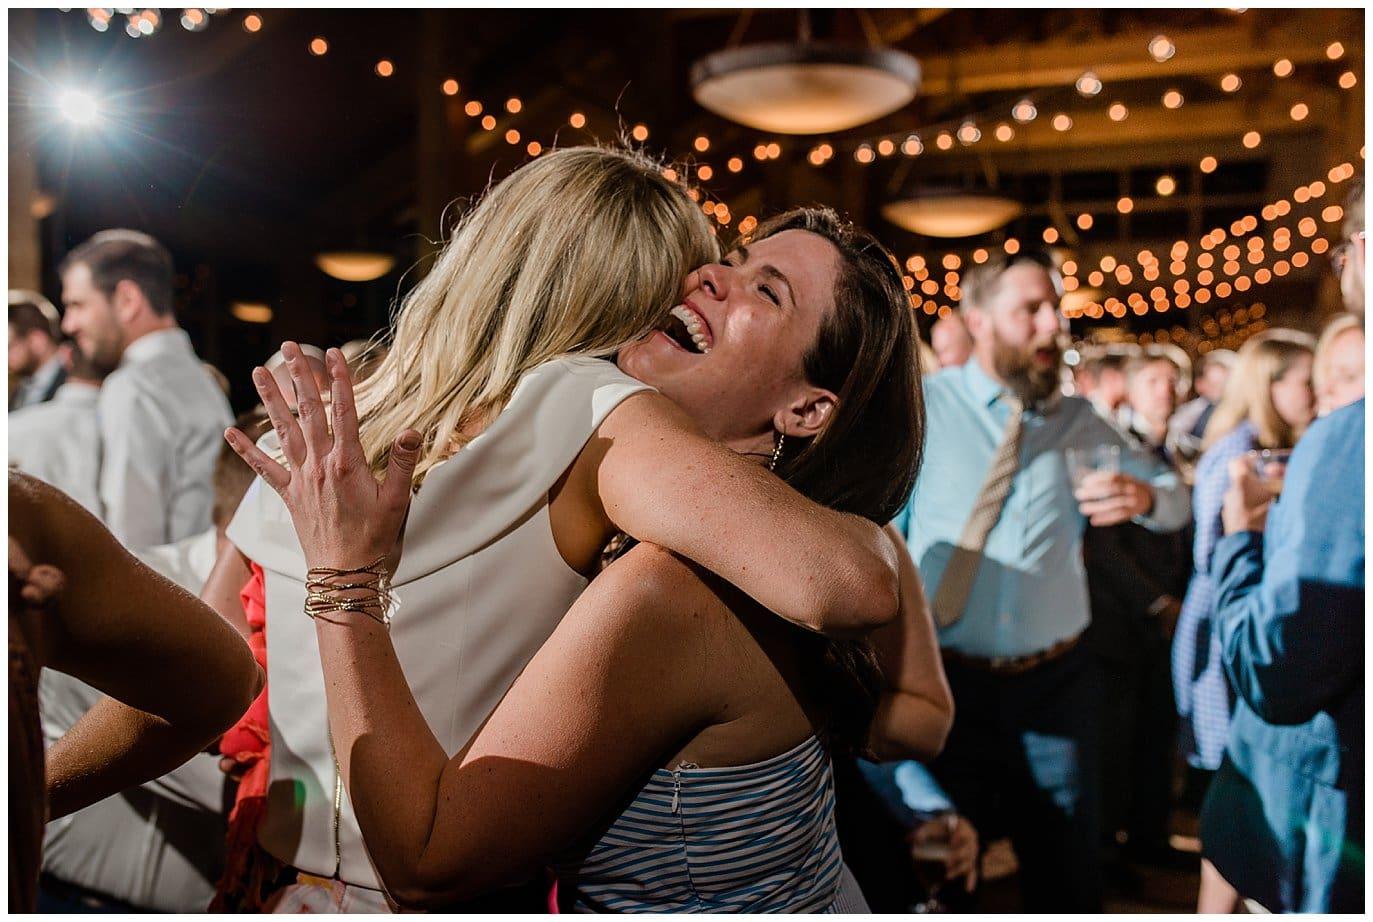 dance party at Arapahoe Basin Black Mountain Lodge Wedding by Arapahoe Basin Wedding Photographer Jennie Crate